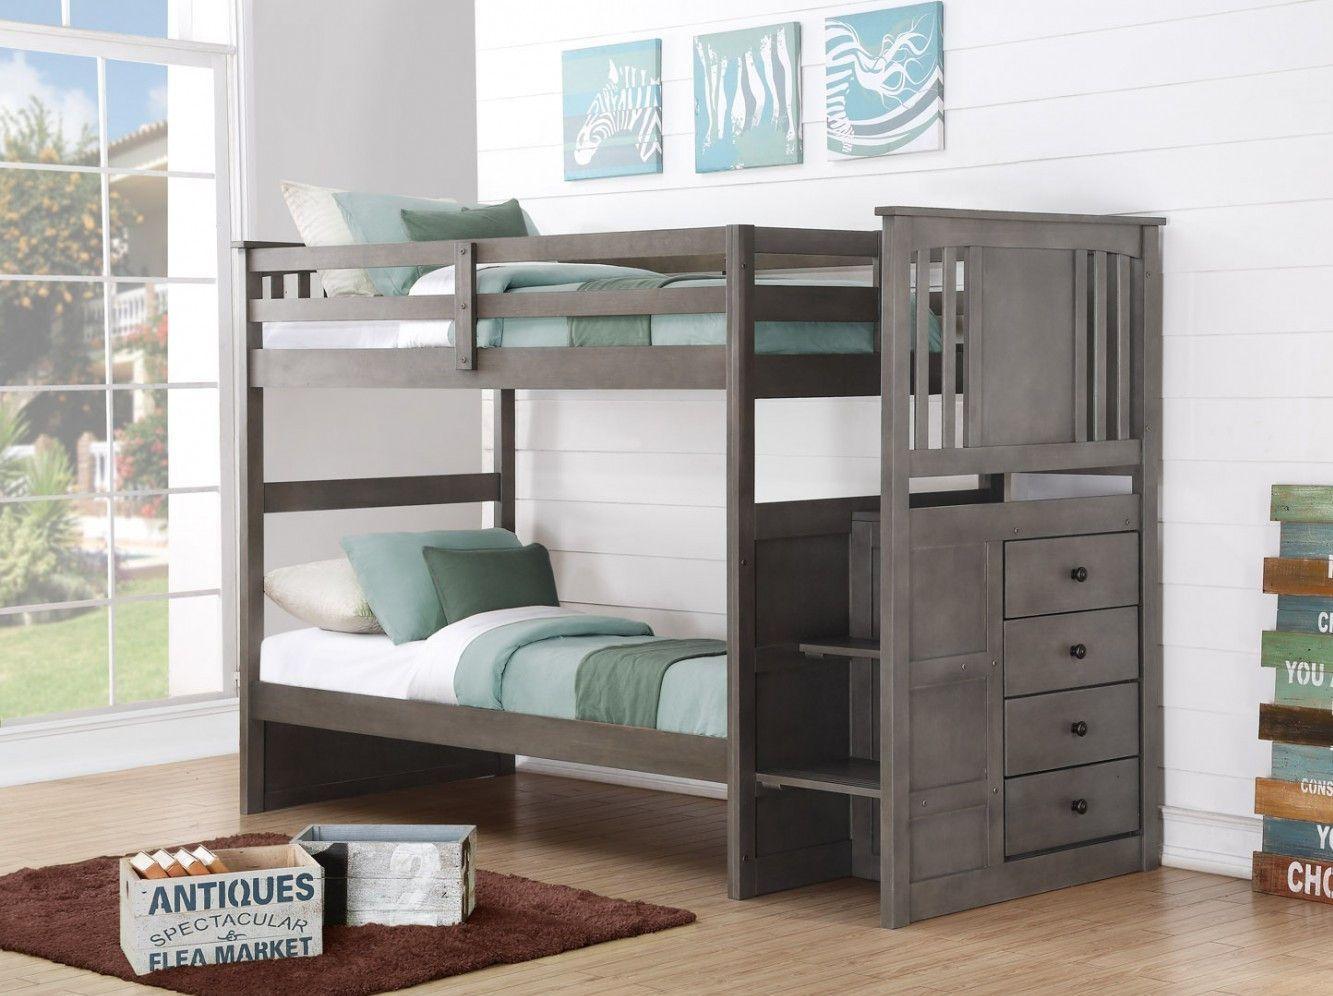 Best 25 Beds For Boys Ideas On Pinterest